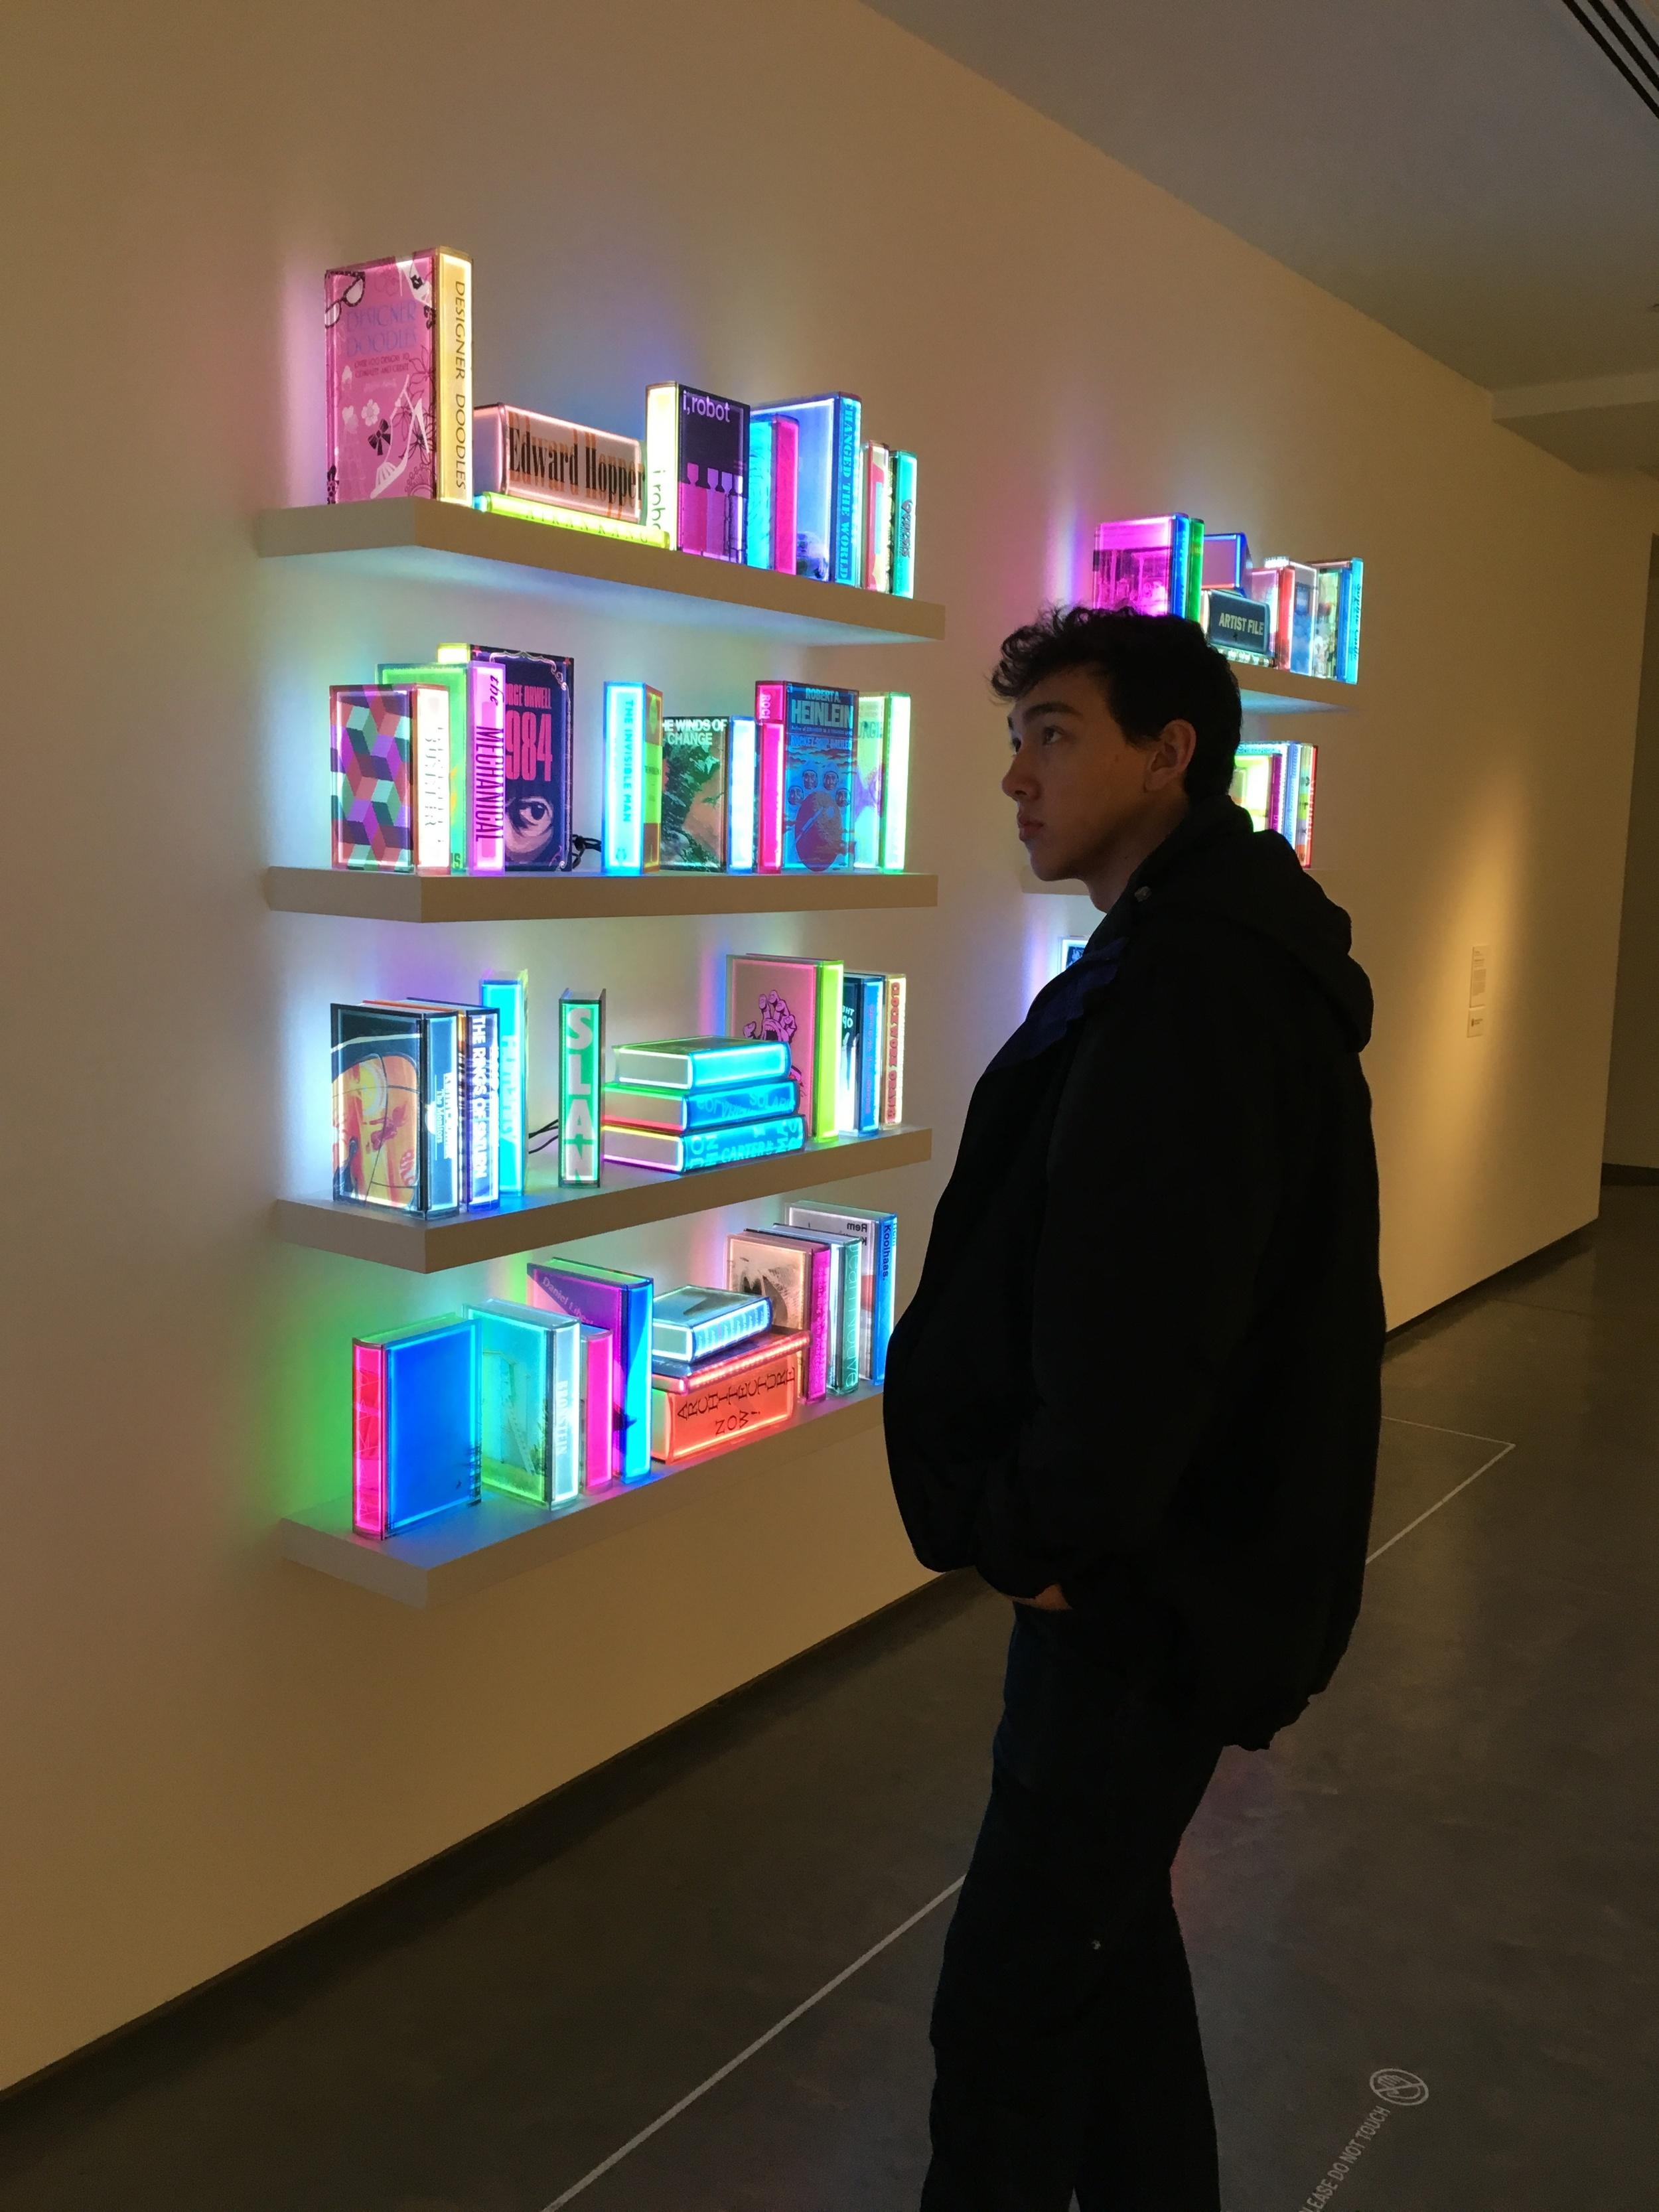 Danny basking in the glow of modern art